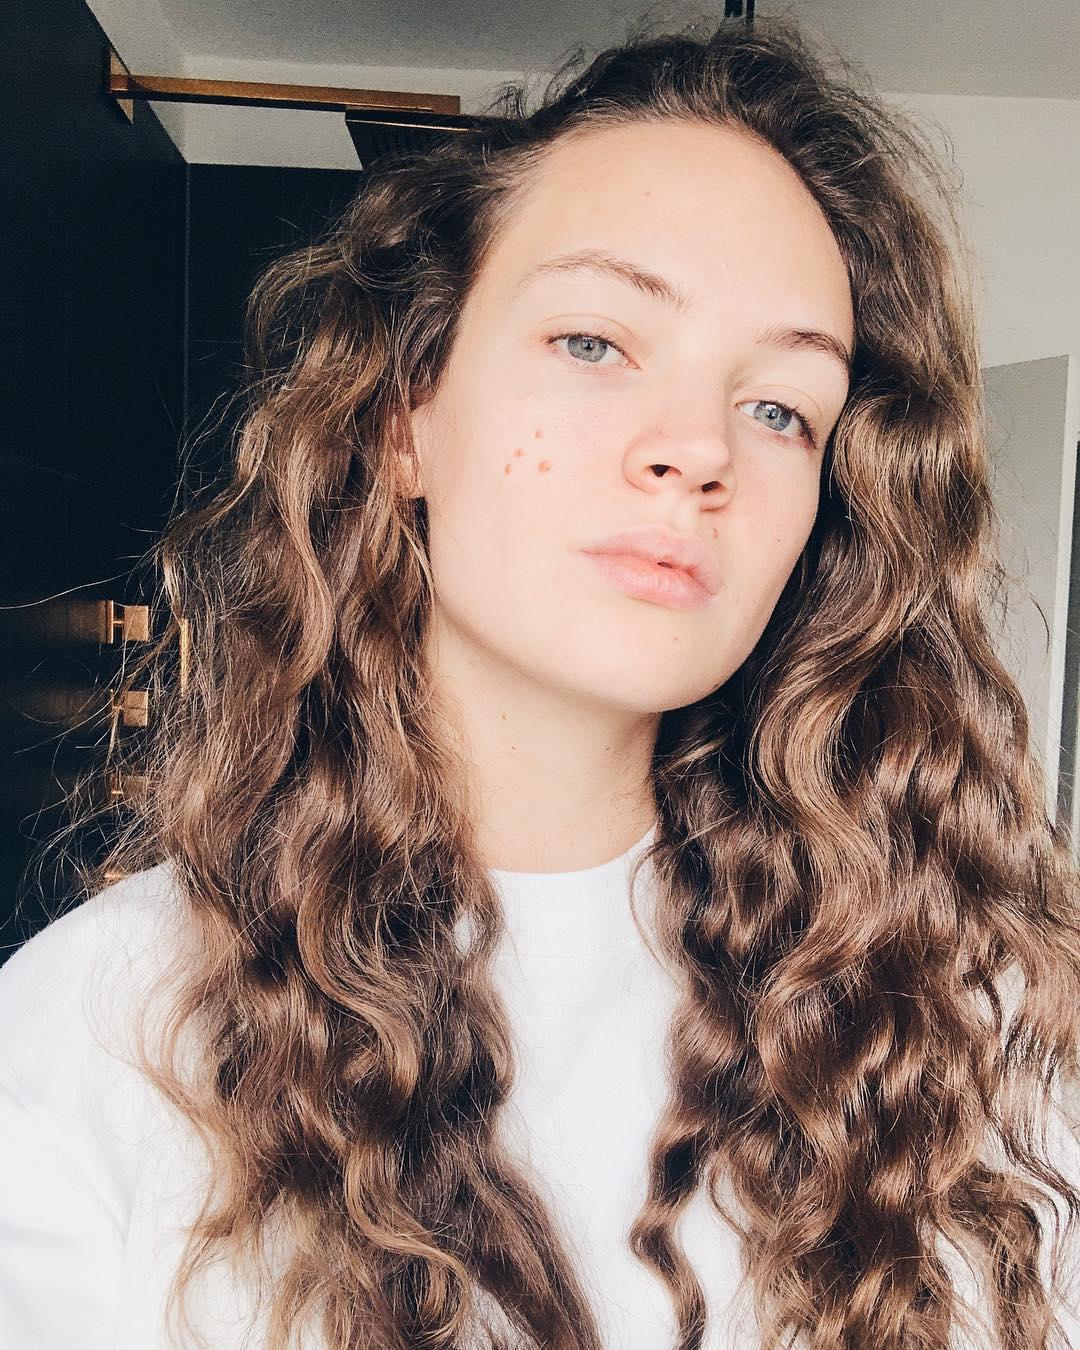 Adrienne-J-liger-2